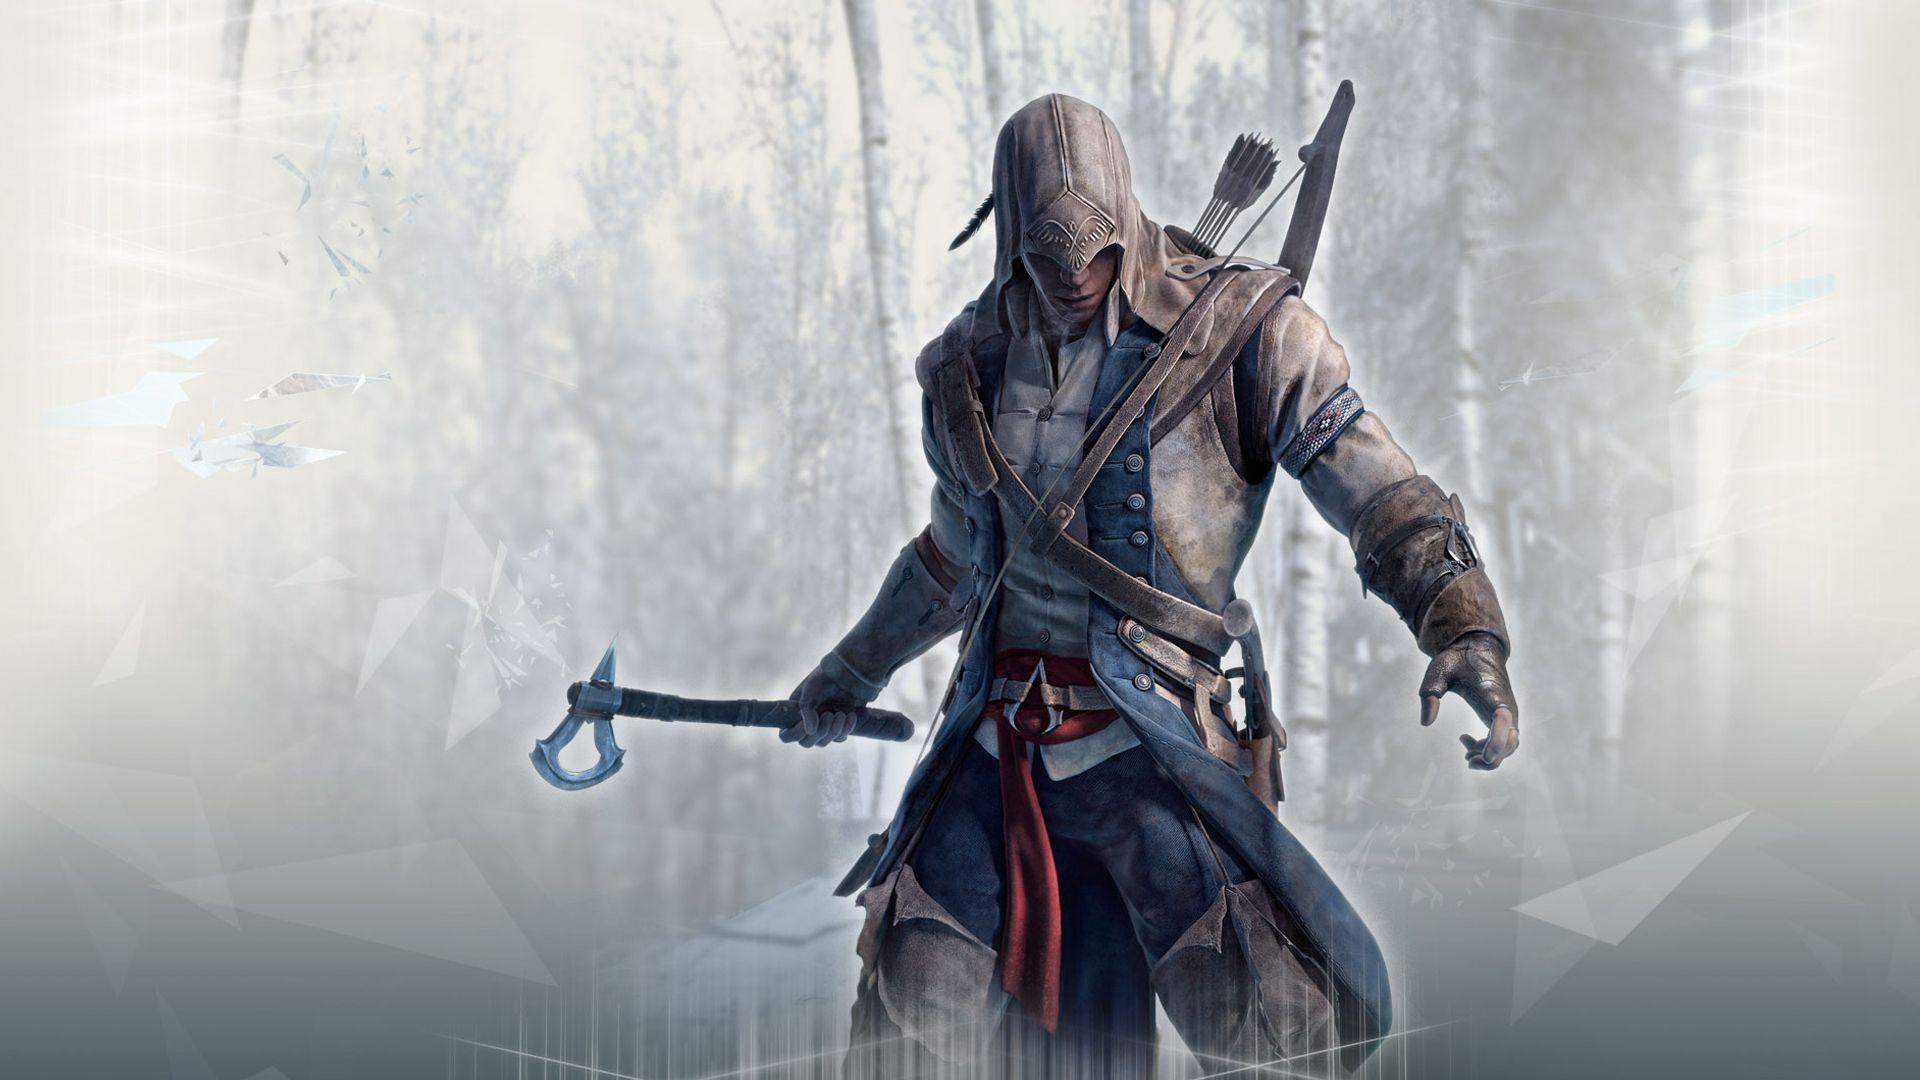 assassins creed 5 wallpaper - photo #15